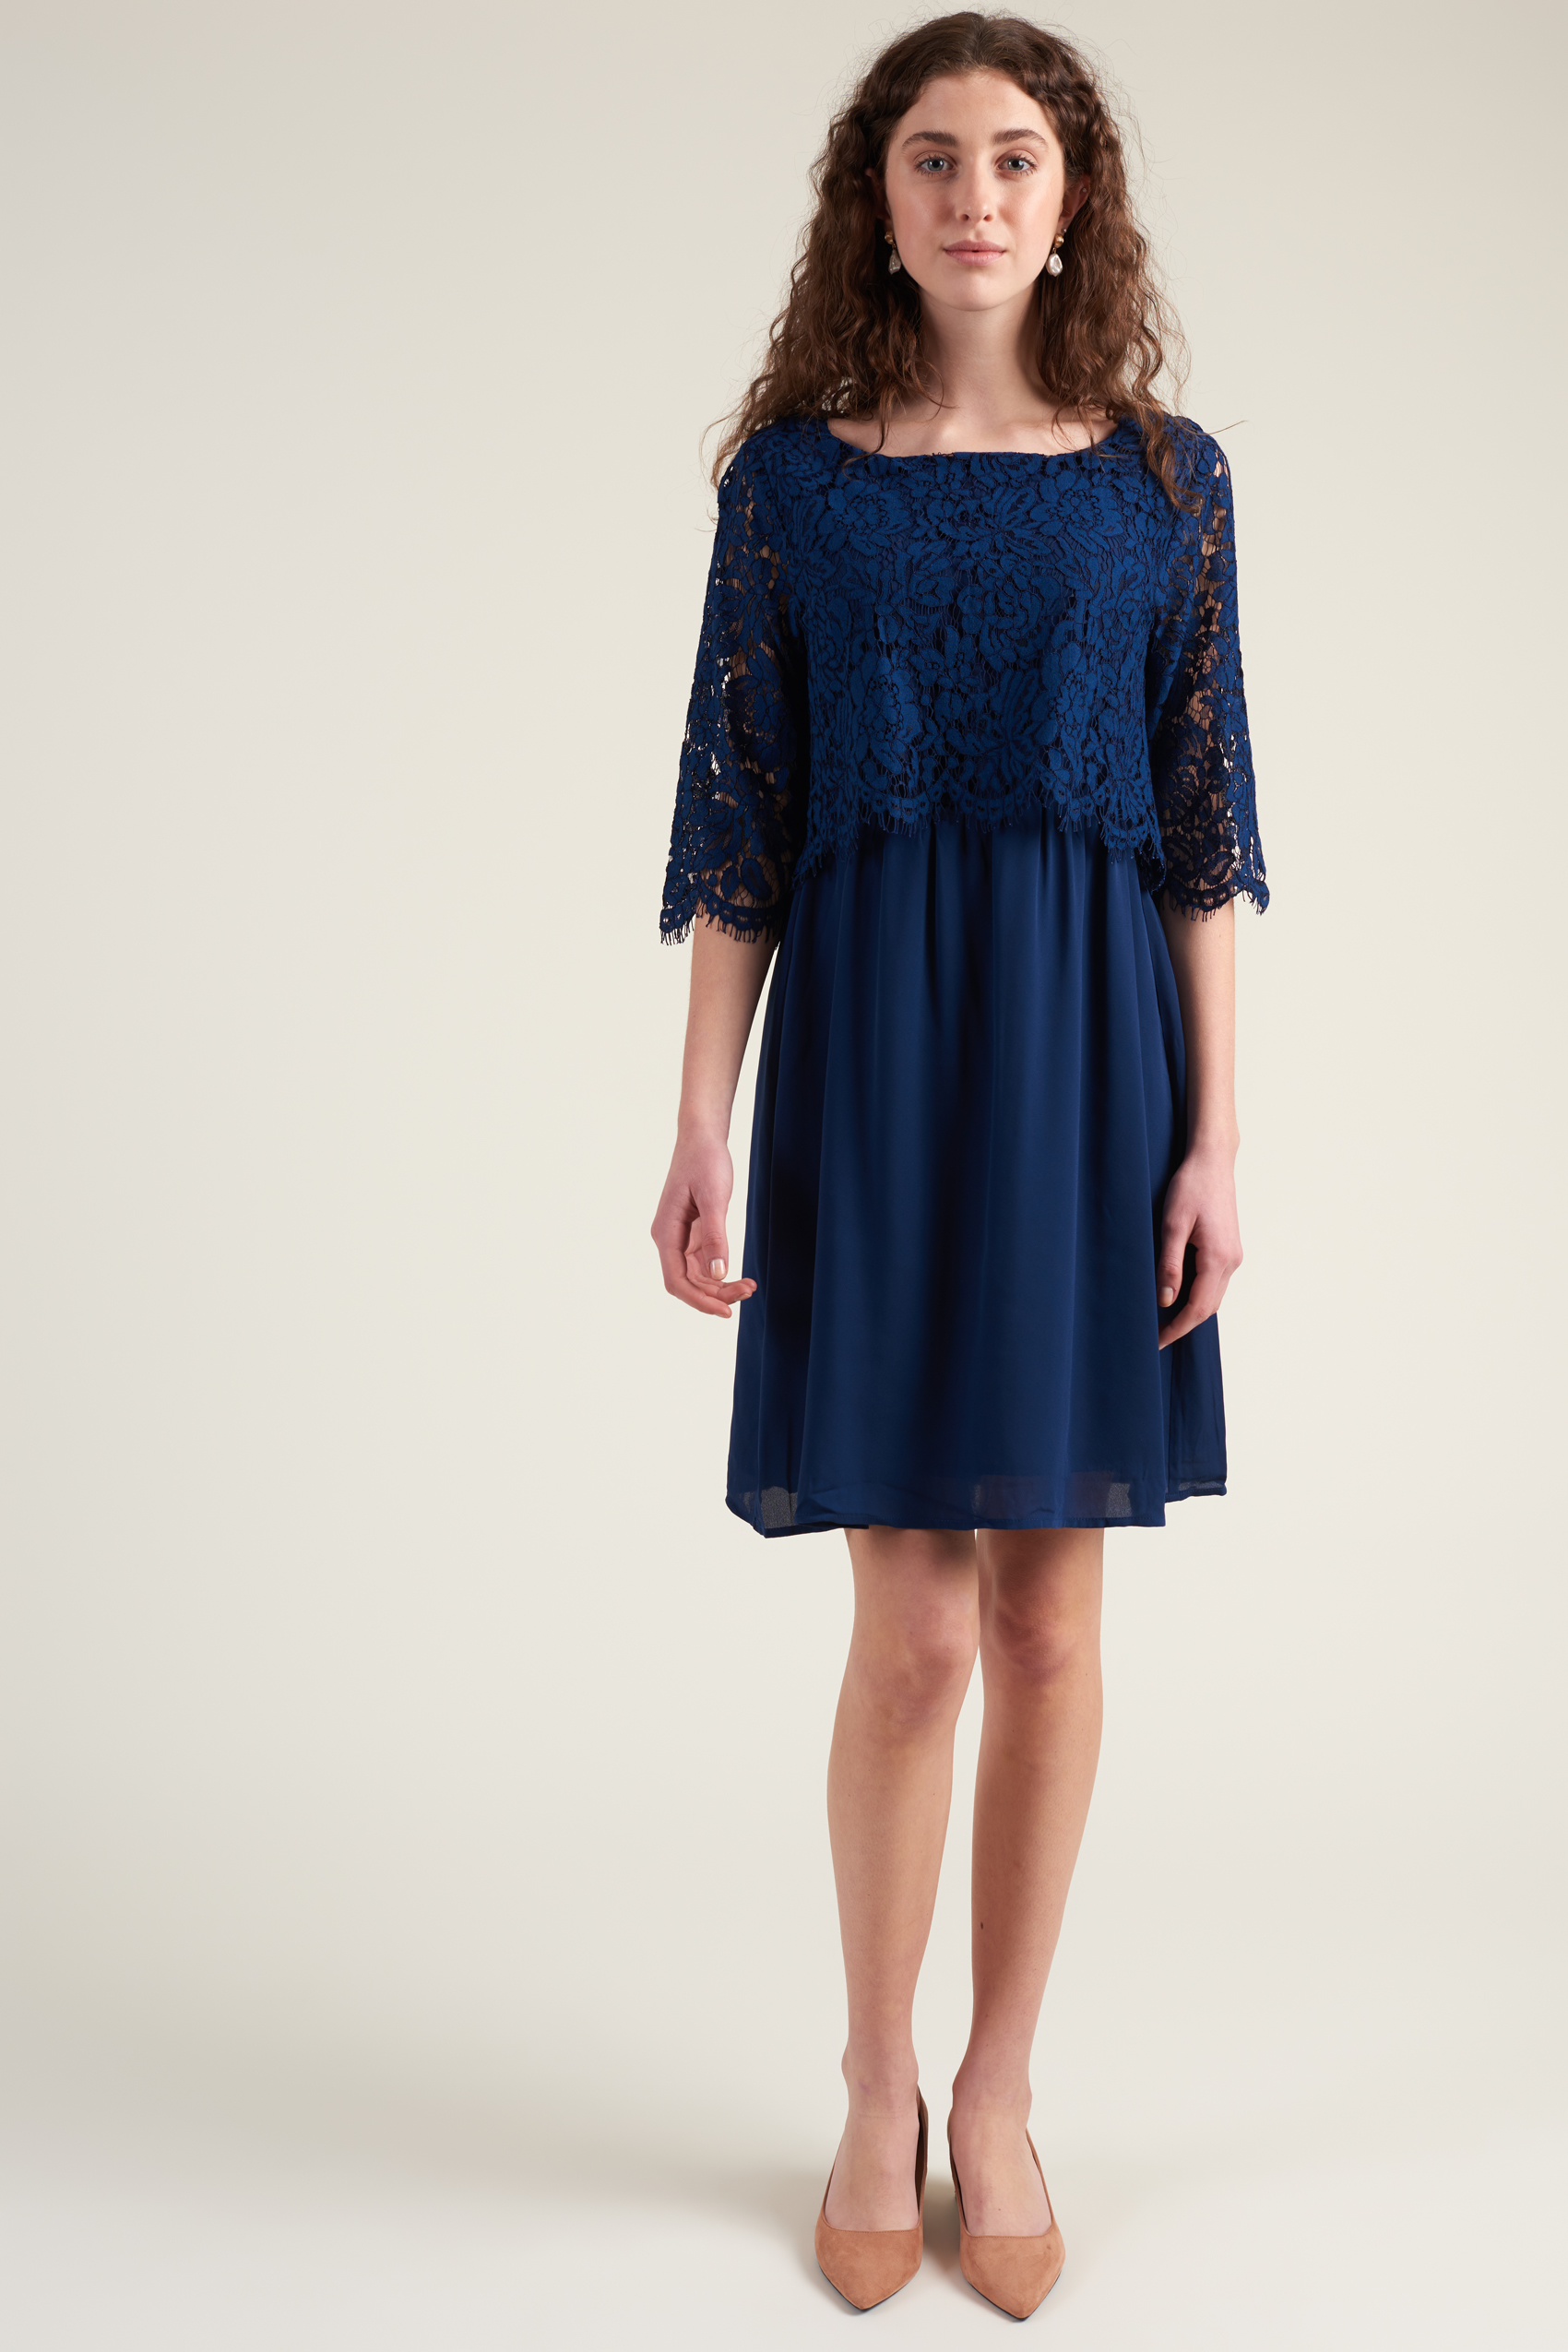 Saint Tropez Klänning Party Dress W Lace Blå